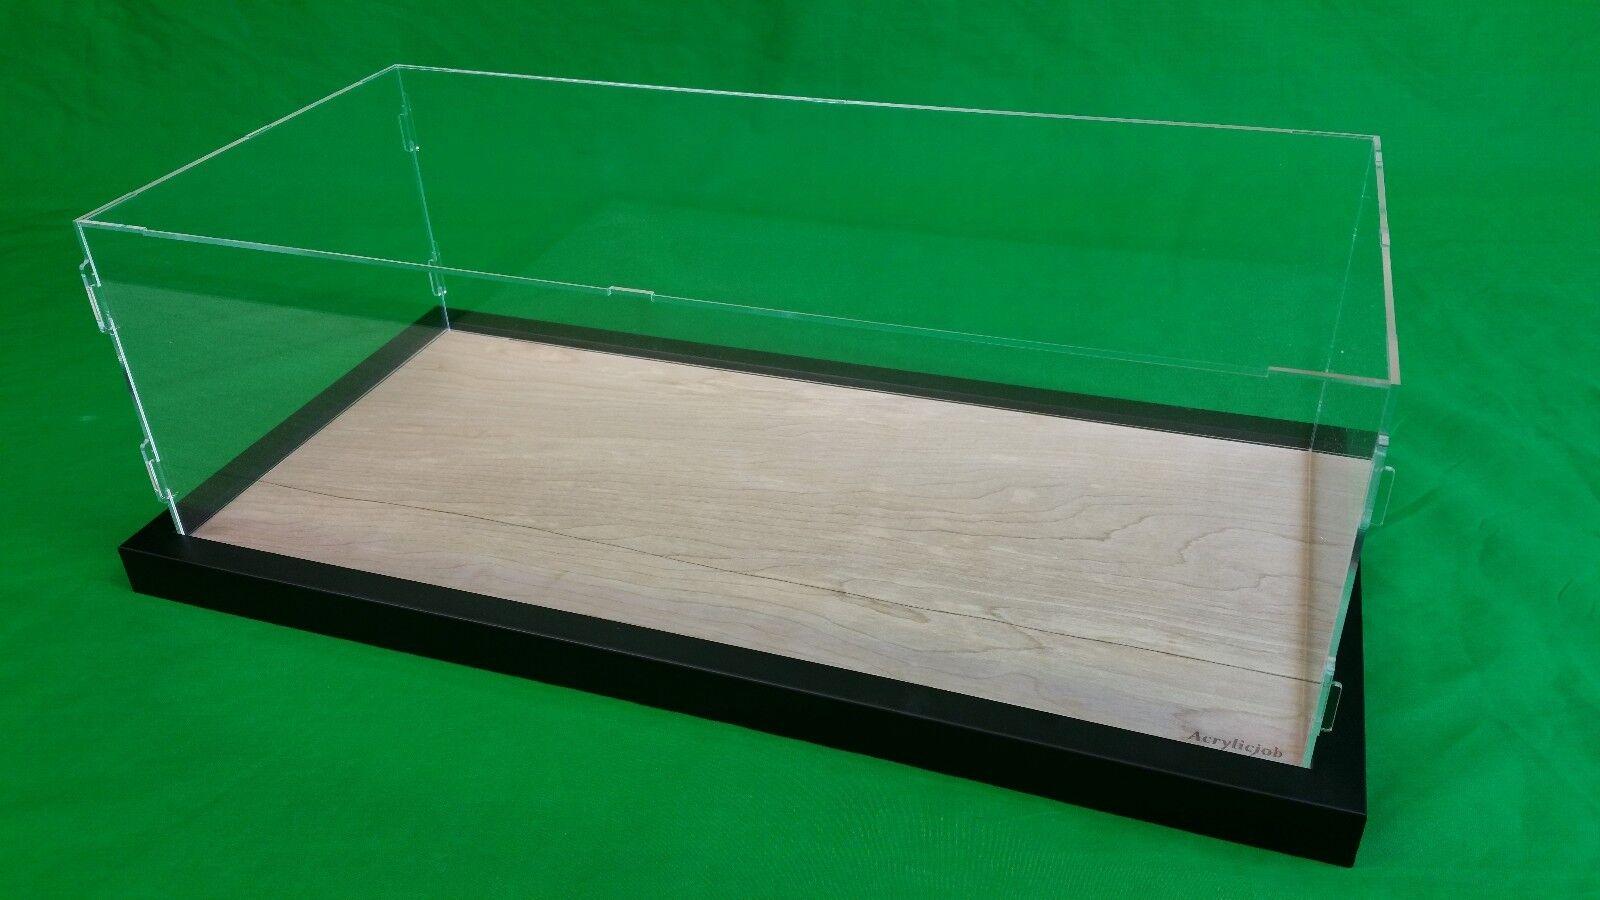 22 x 9 3/4 x 7 Pocher Acrylic Display Case Showcase w/Wood Base for 1:8 Model